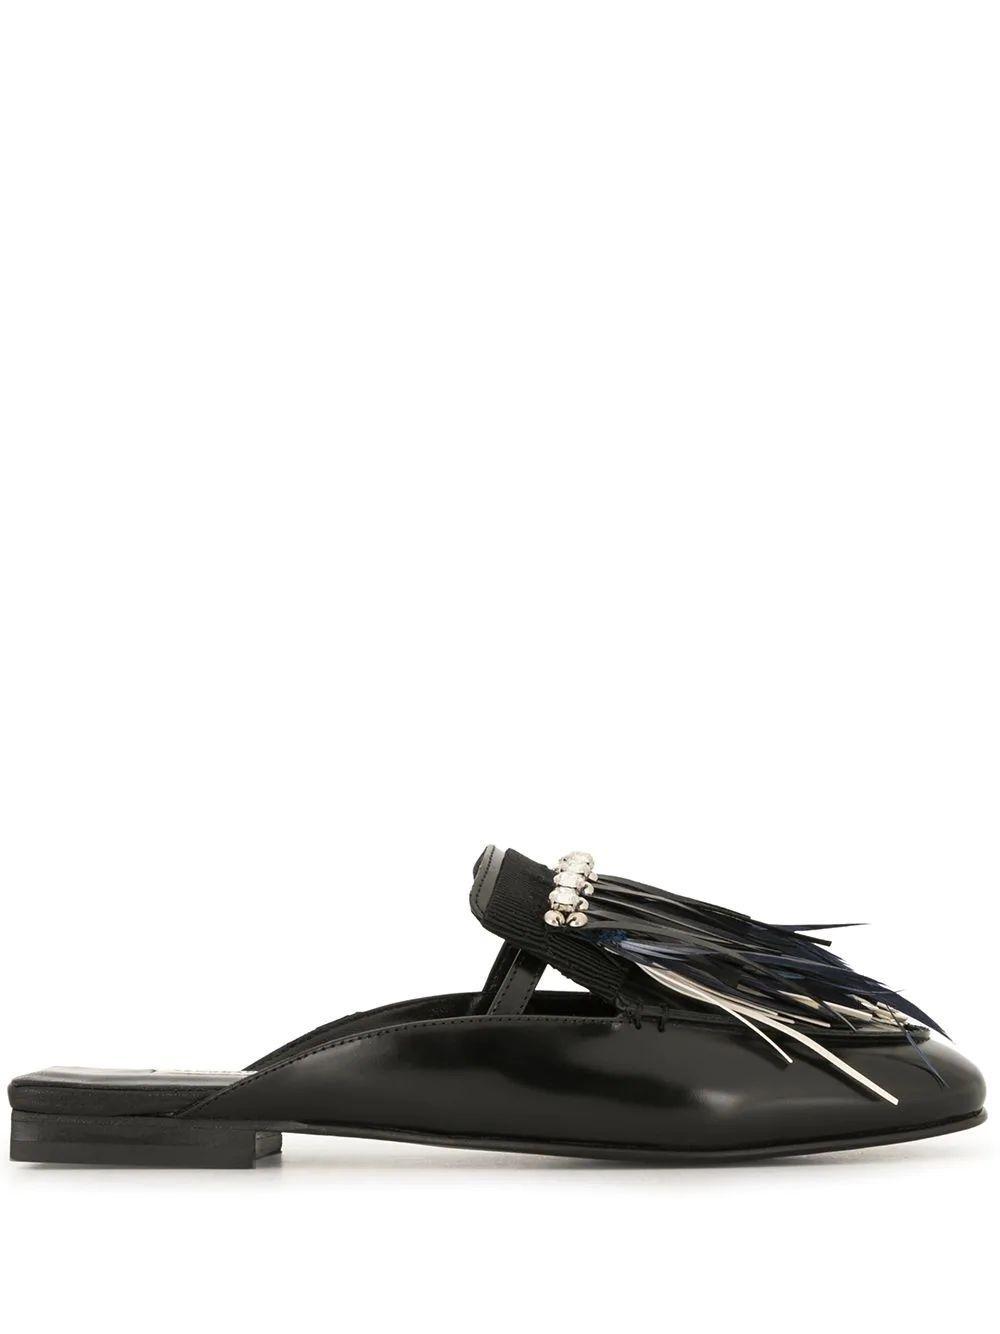 Chic Edginess Slip On Loafer Item # 202-850401